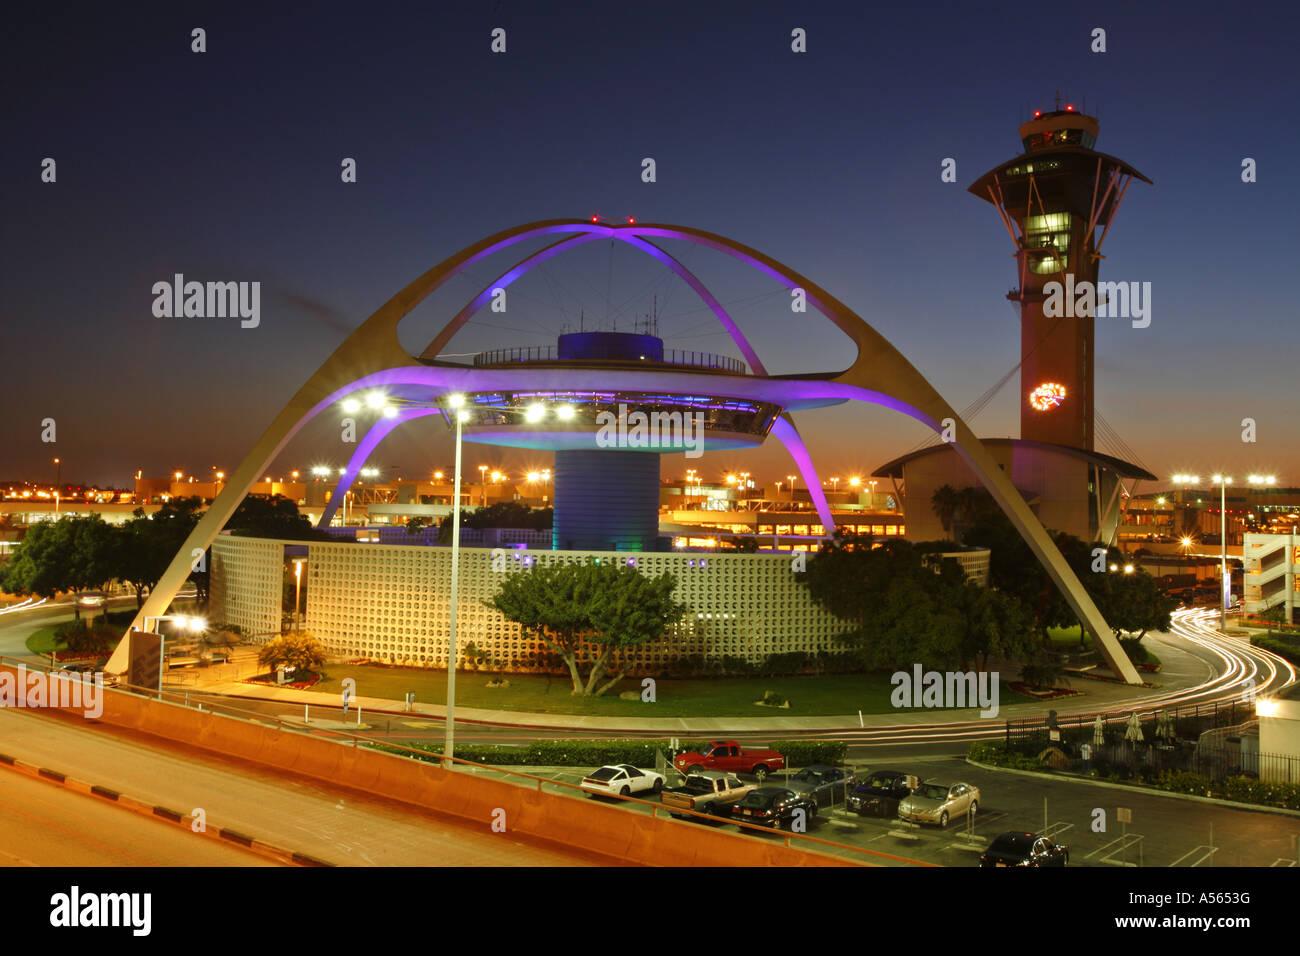 Encounter Restaurant Los Angeles International Airport LAX El Segundo Los Angeles County California United States - Stock Image